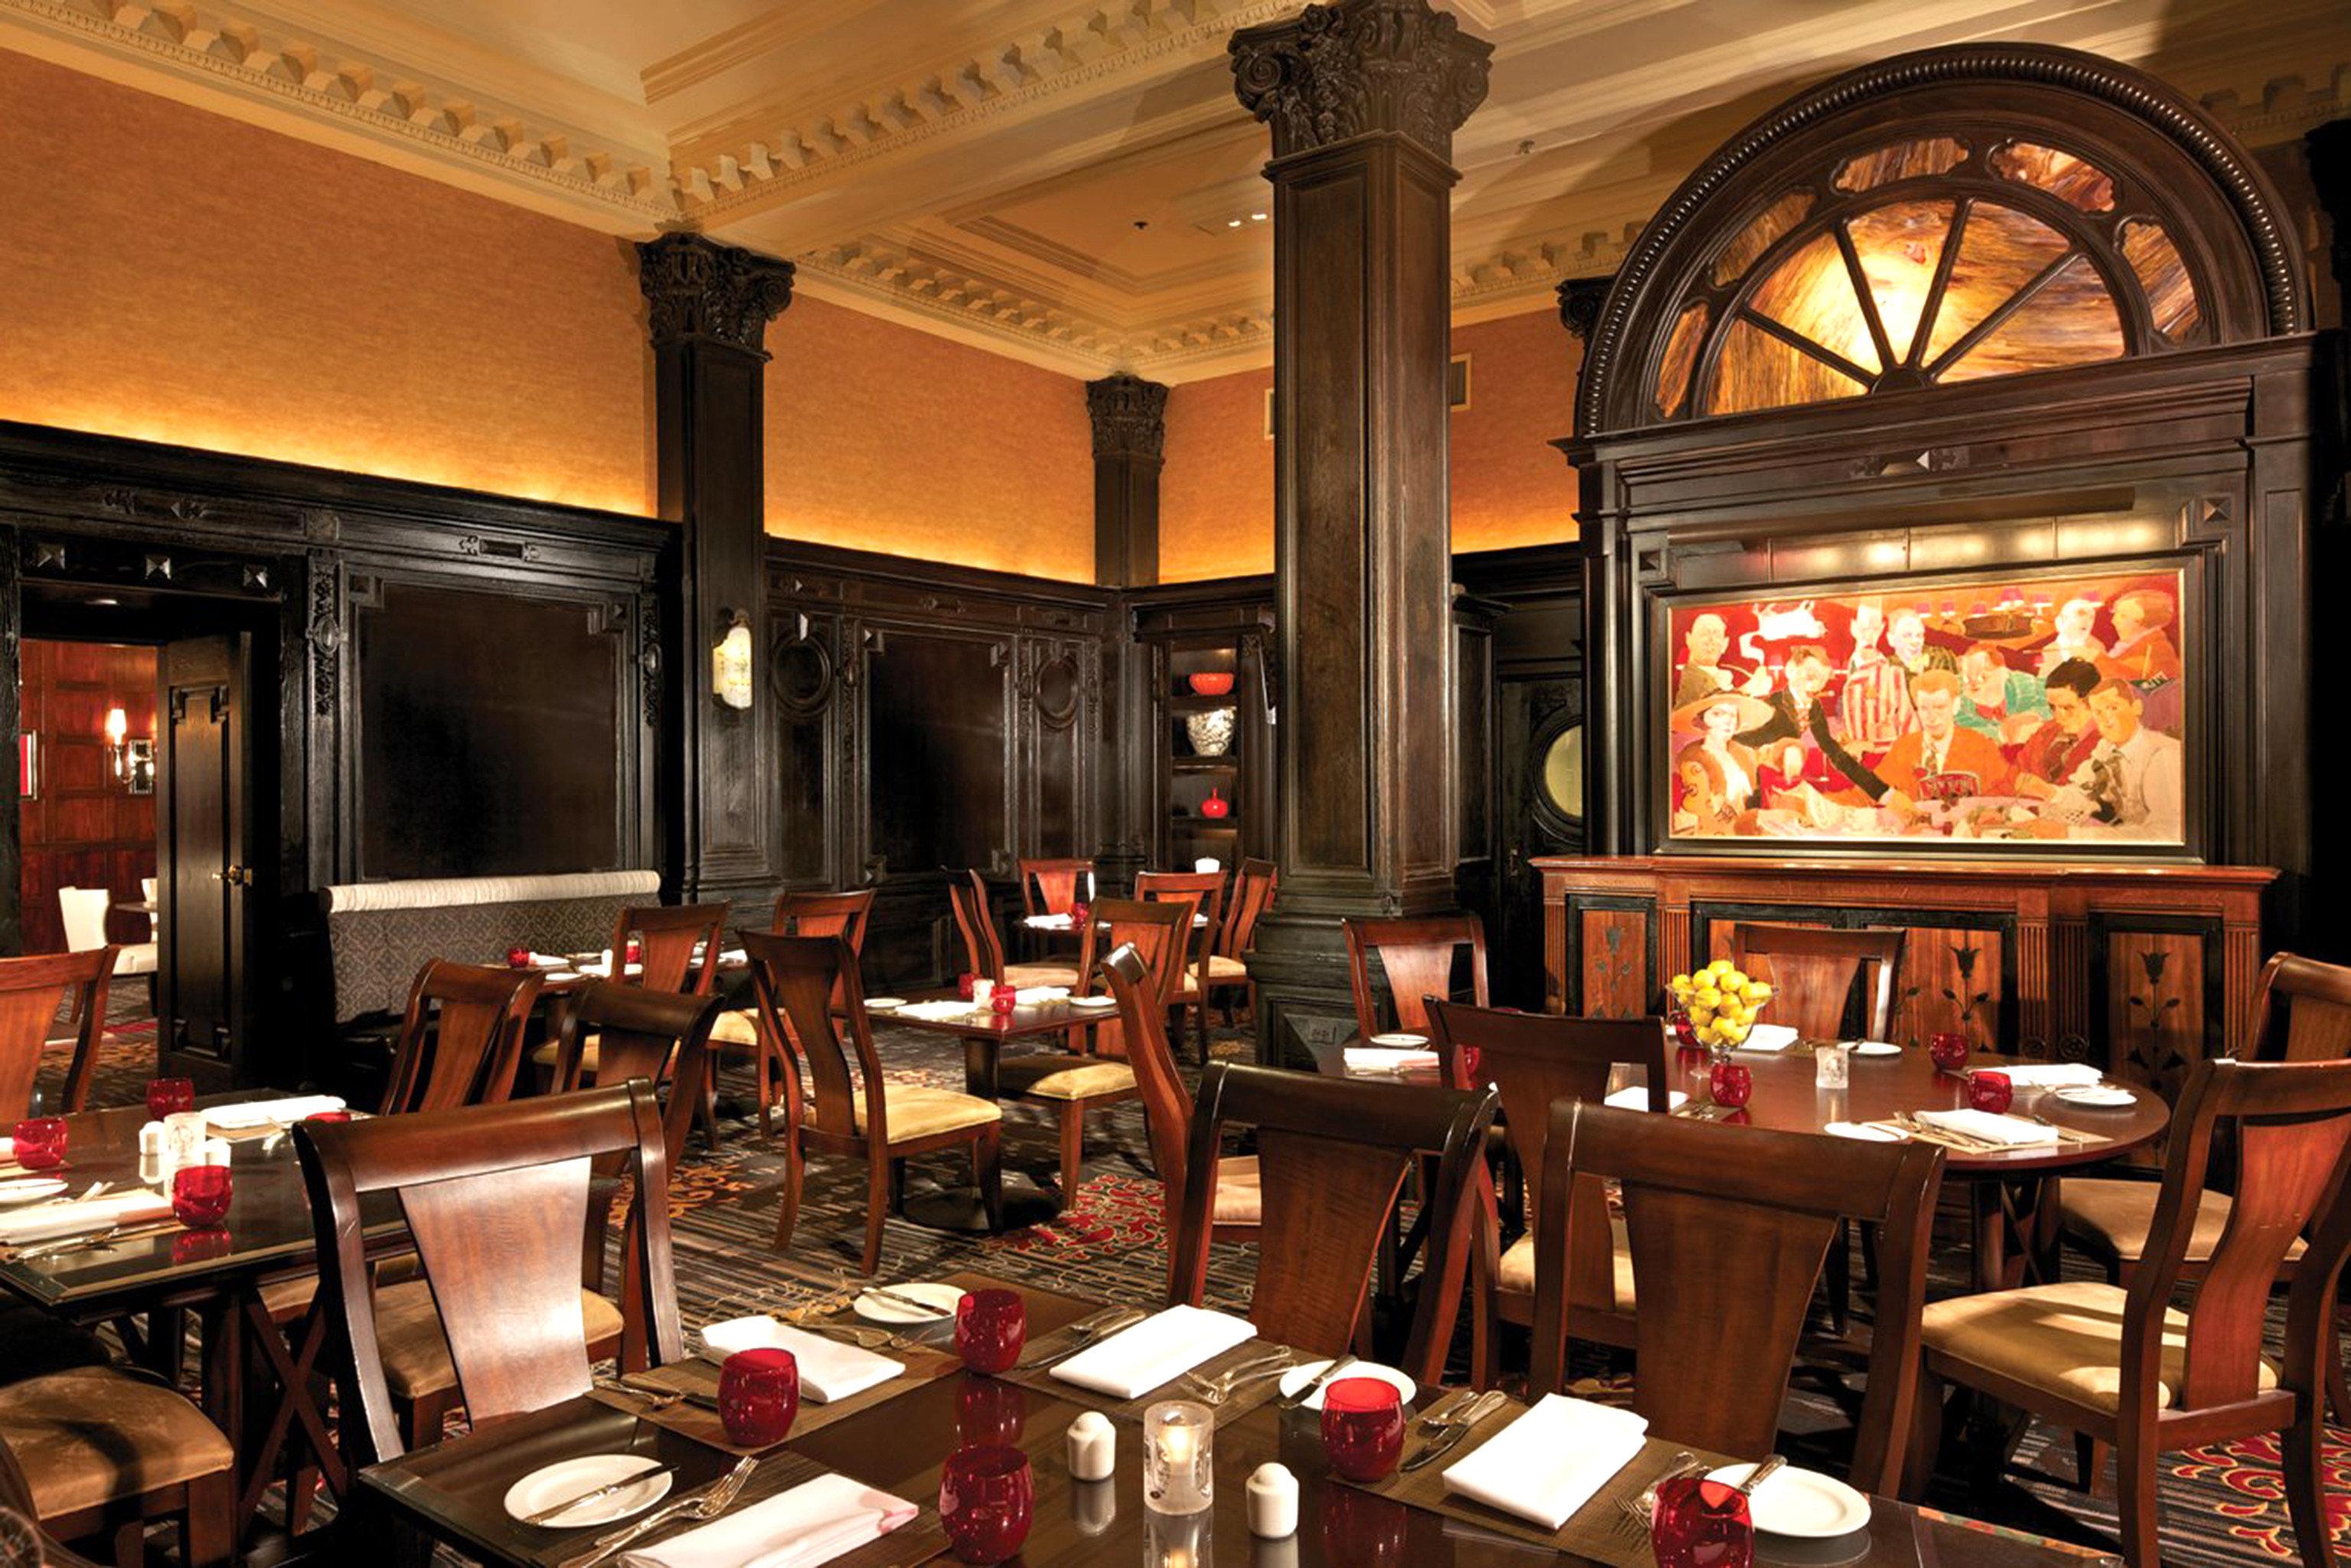 Bar Dining Drink Eat Hip Luxury Modern restaurant function hall café dining table